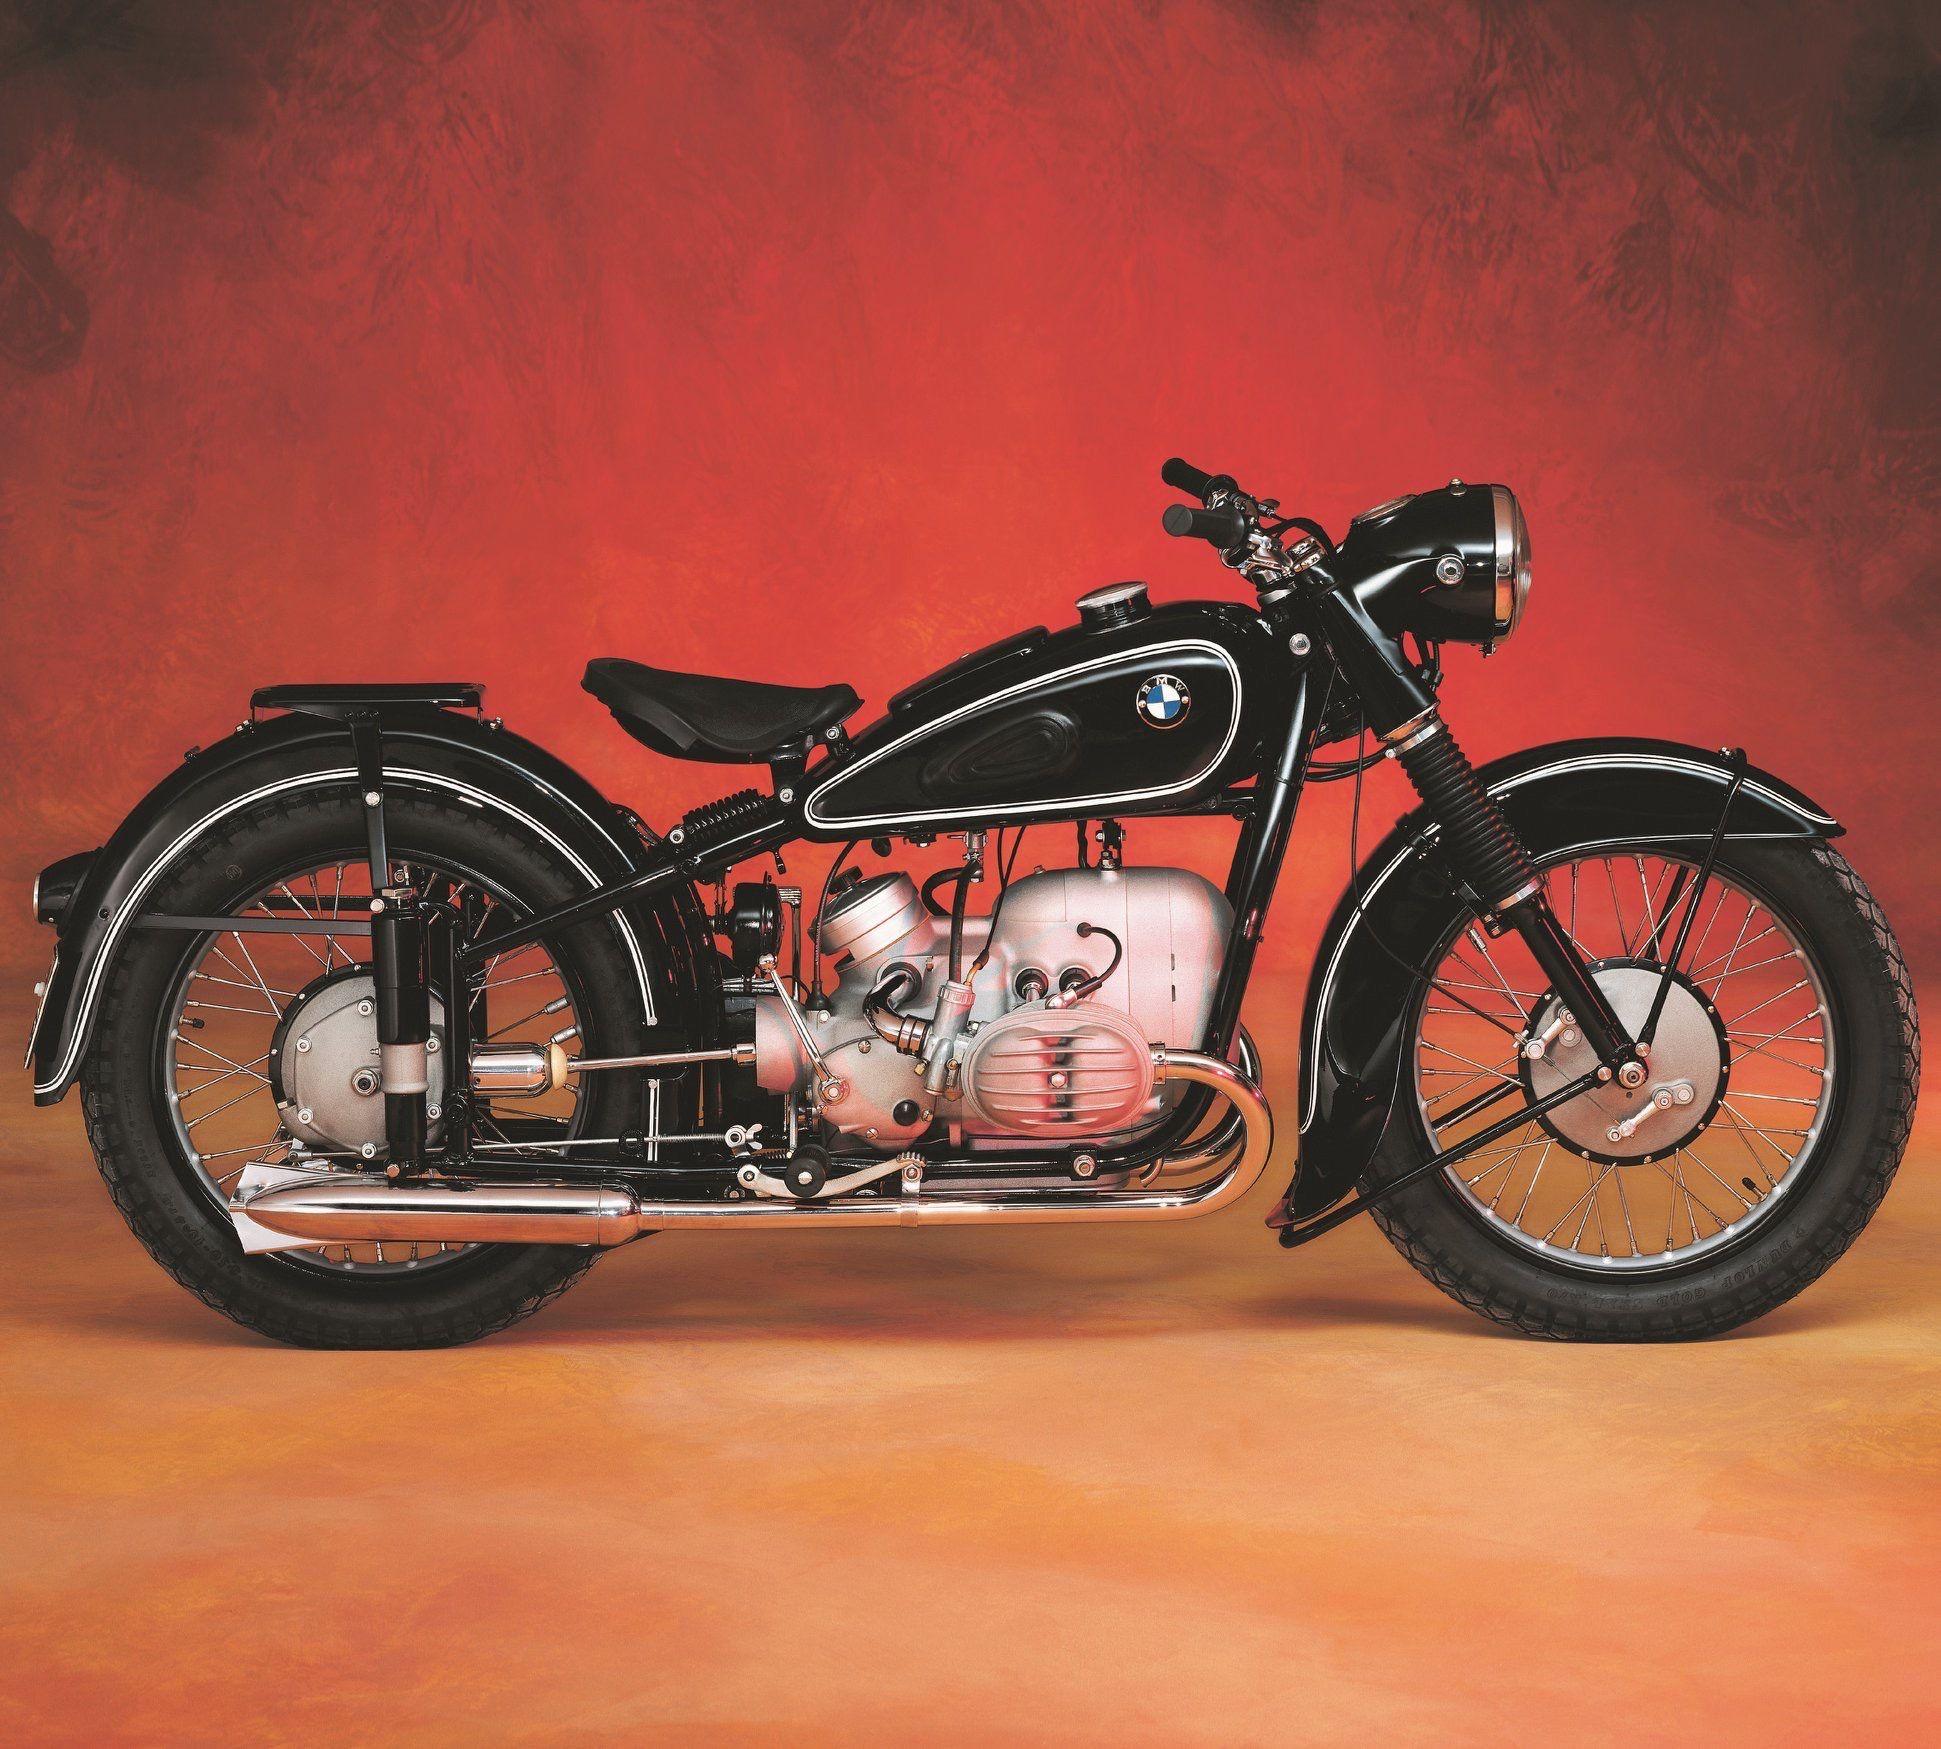 Pin By Berni Schweiger On Motorcycle Bmw Motorcycle Vintage Bmw Motorcycles Bmw Vintage